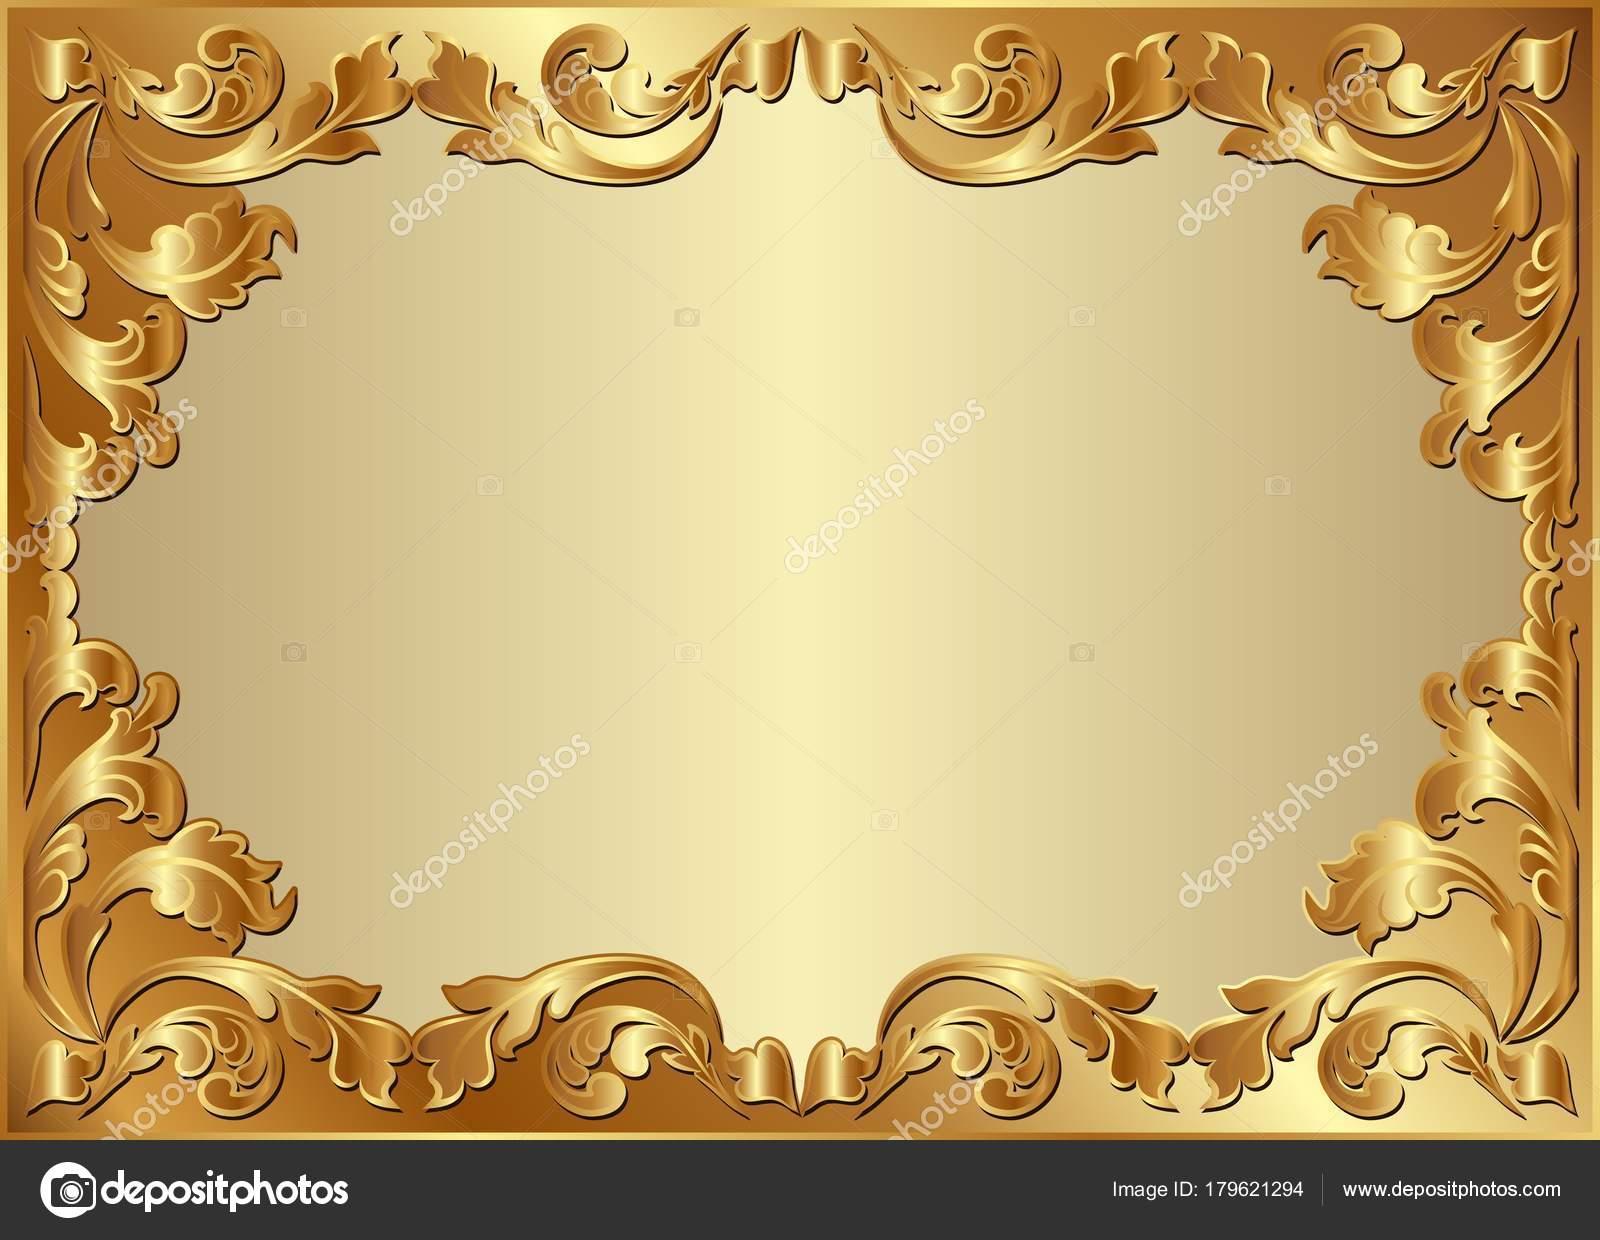 Floral Ornament Vector Free: Golden Background Floral Ornaments